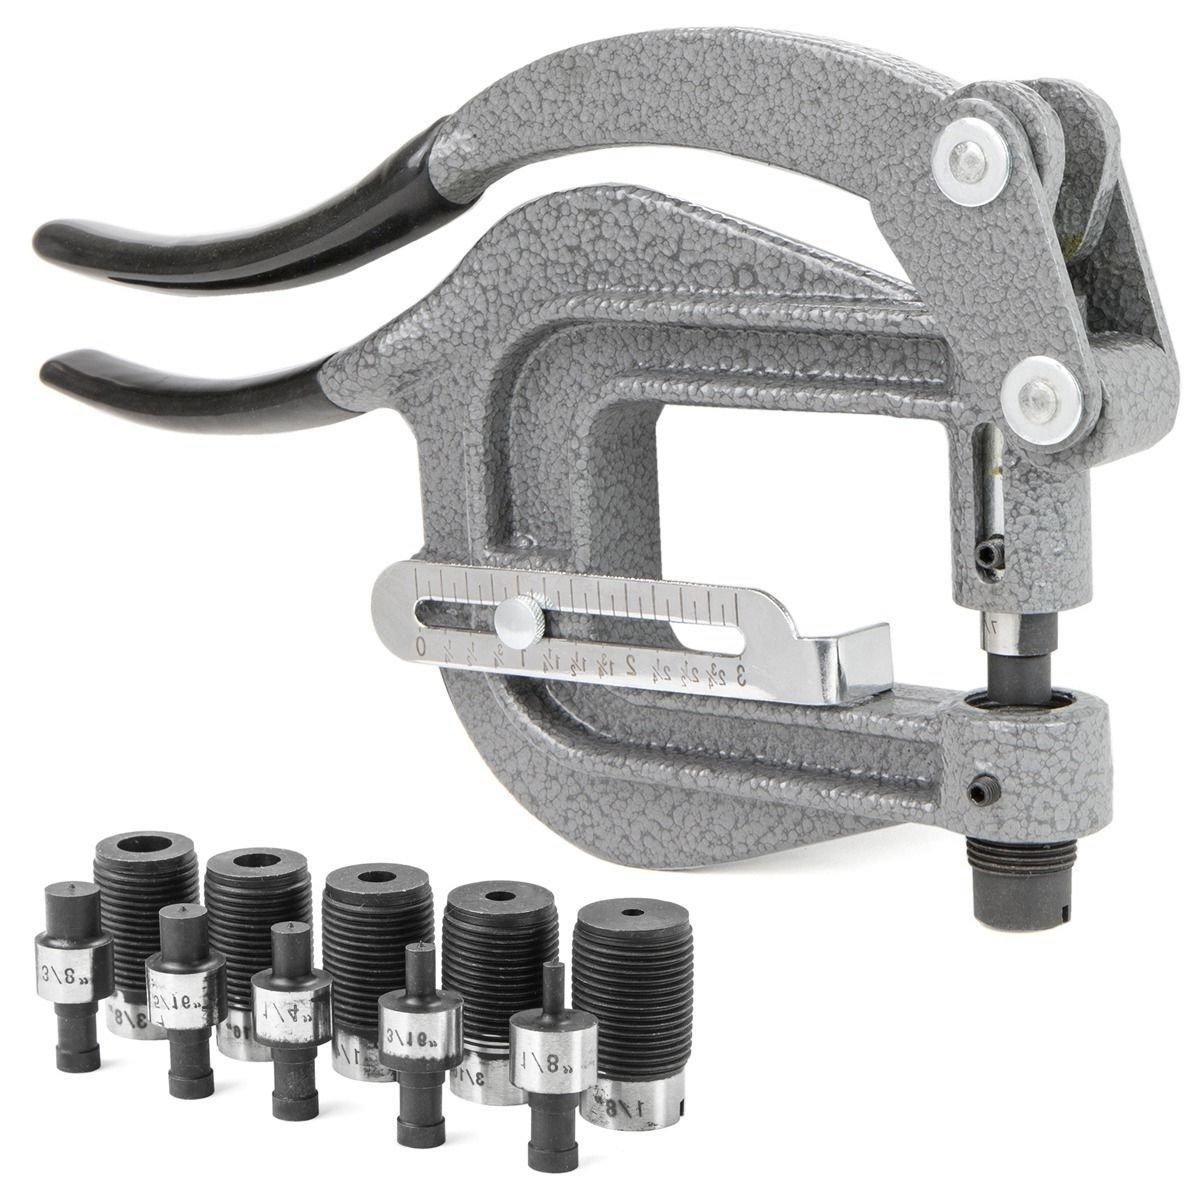 Power Punch Deep Thorat kit Sheet Metal Rivet Hole Portable Hand Auto Body Tool